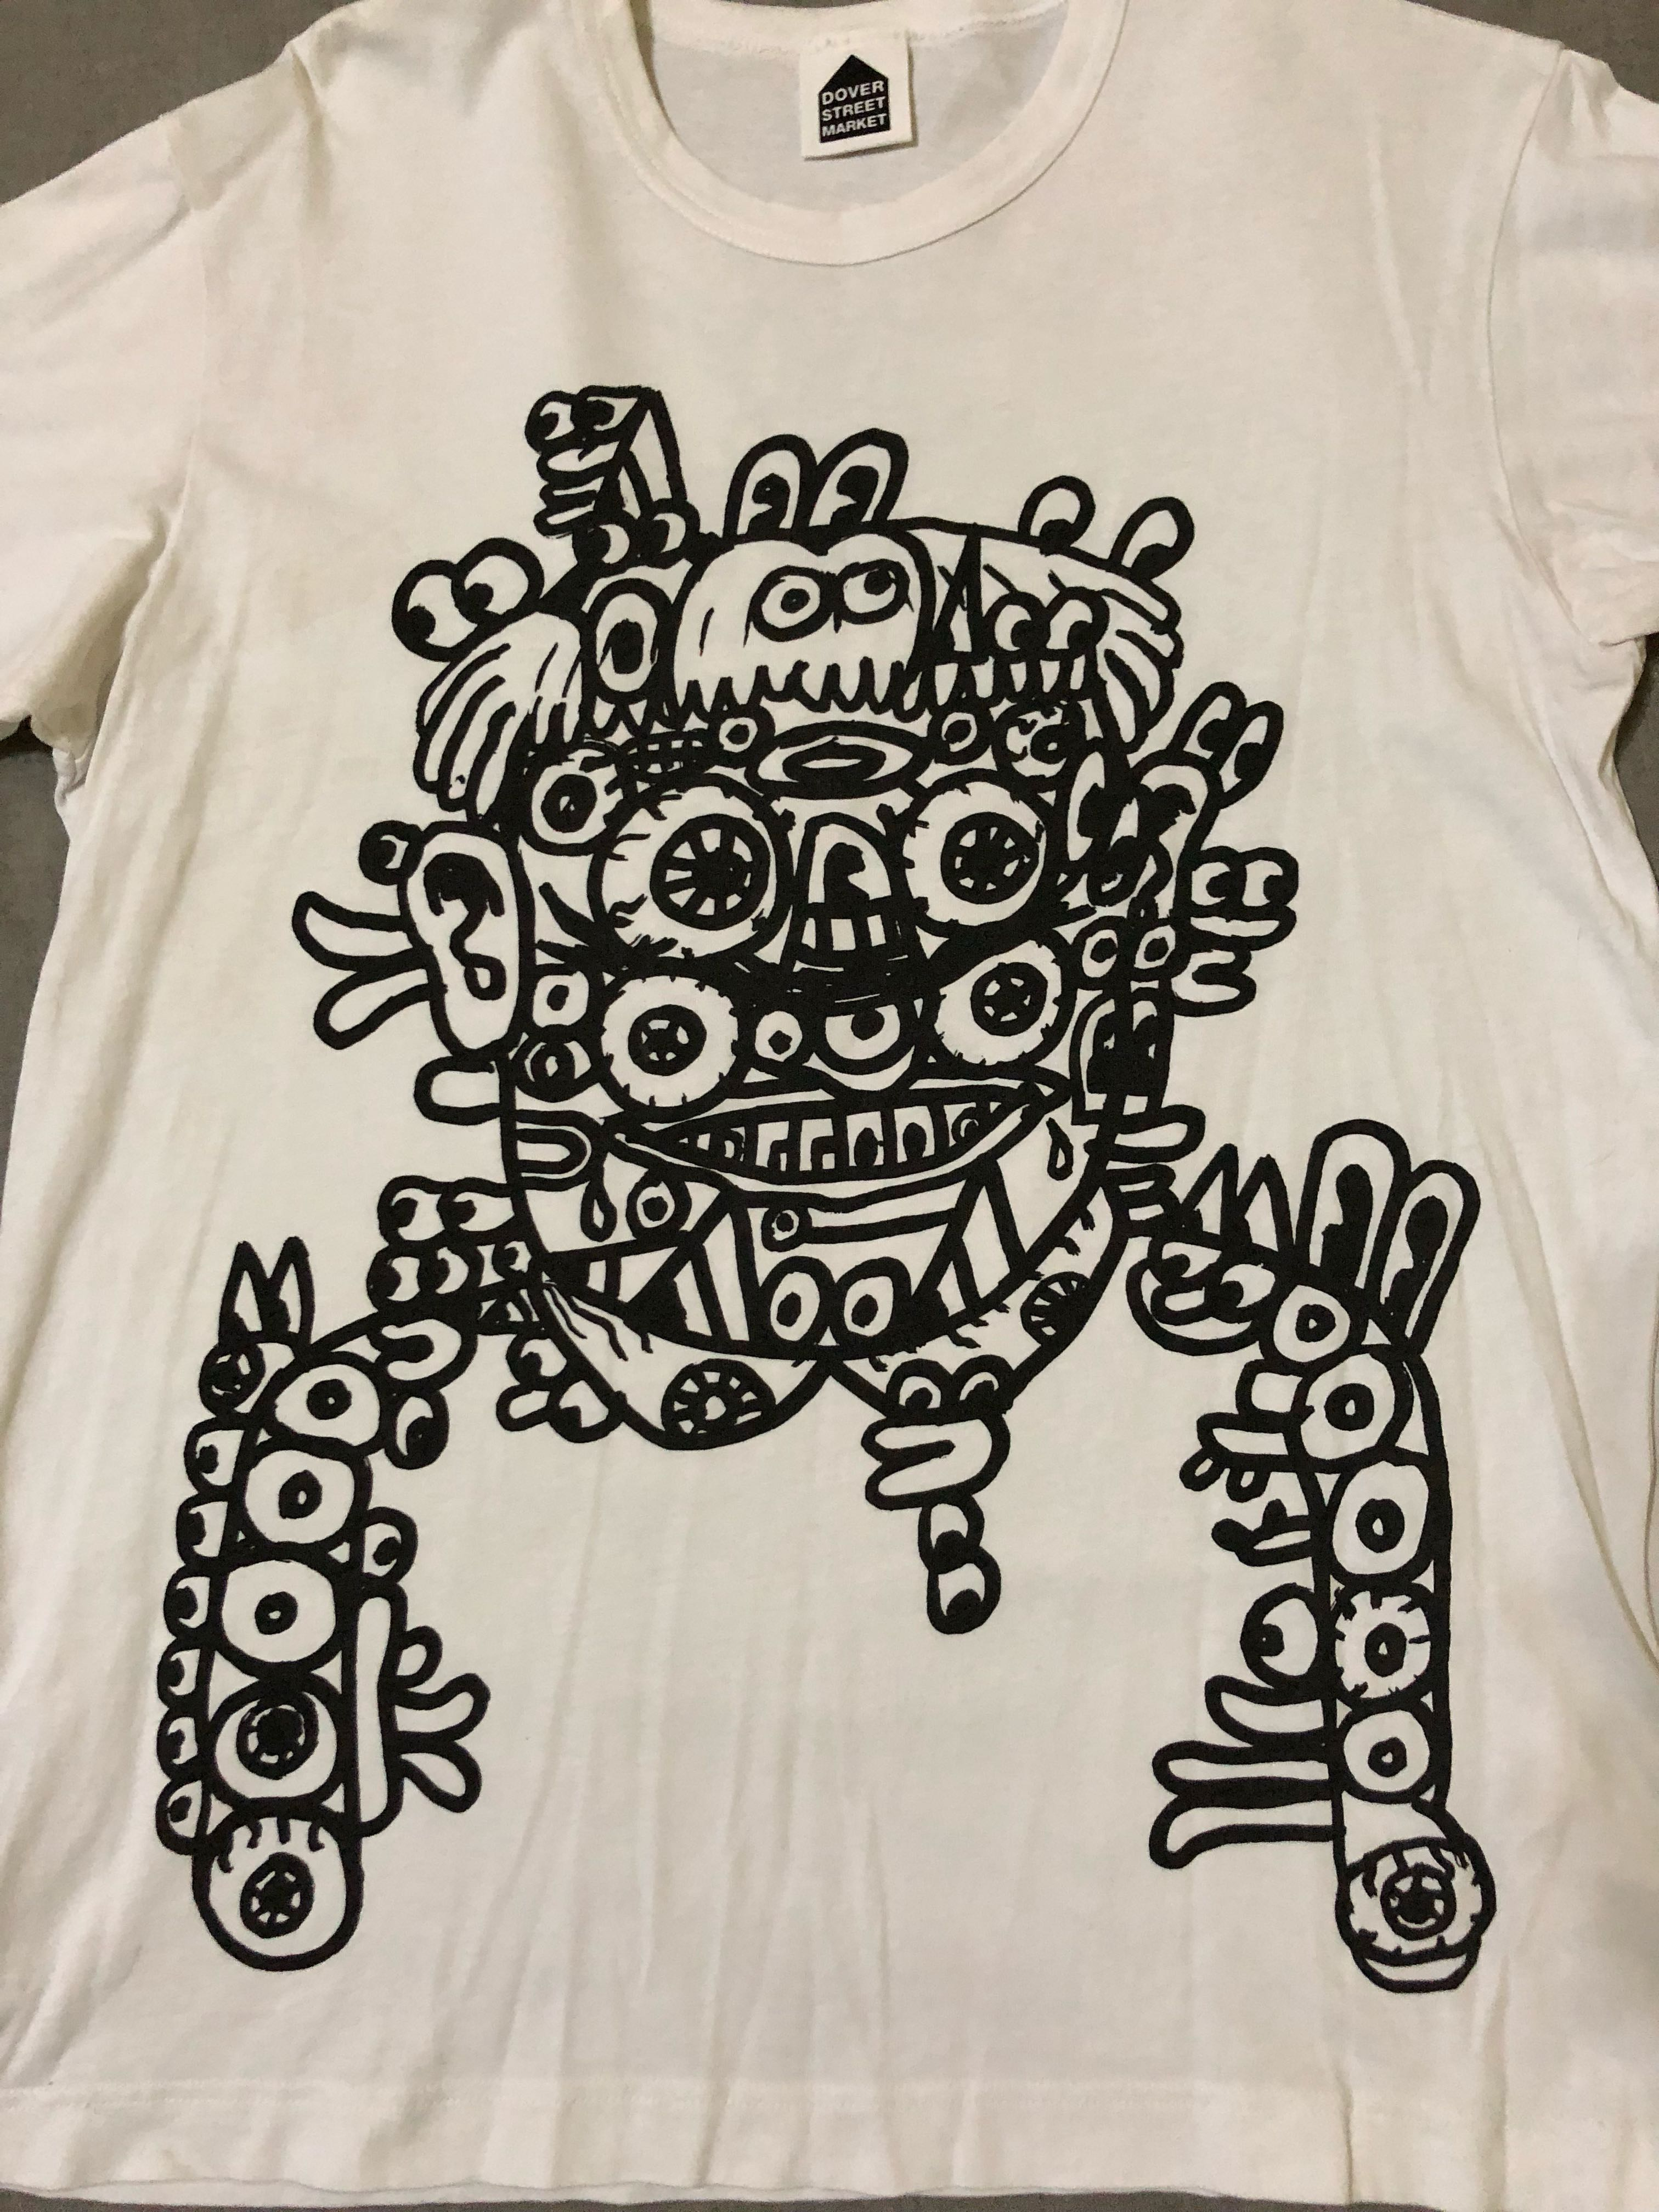 6011e5c31 Dover Street Market Noah Lyons Weirdos T-Shirt (white), Men's Fashion,  Clothes, Tops on Carousell